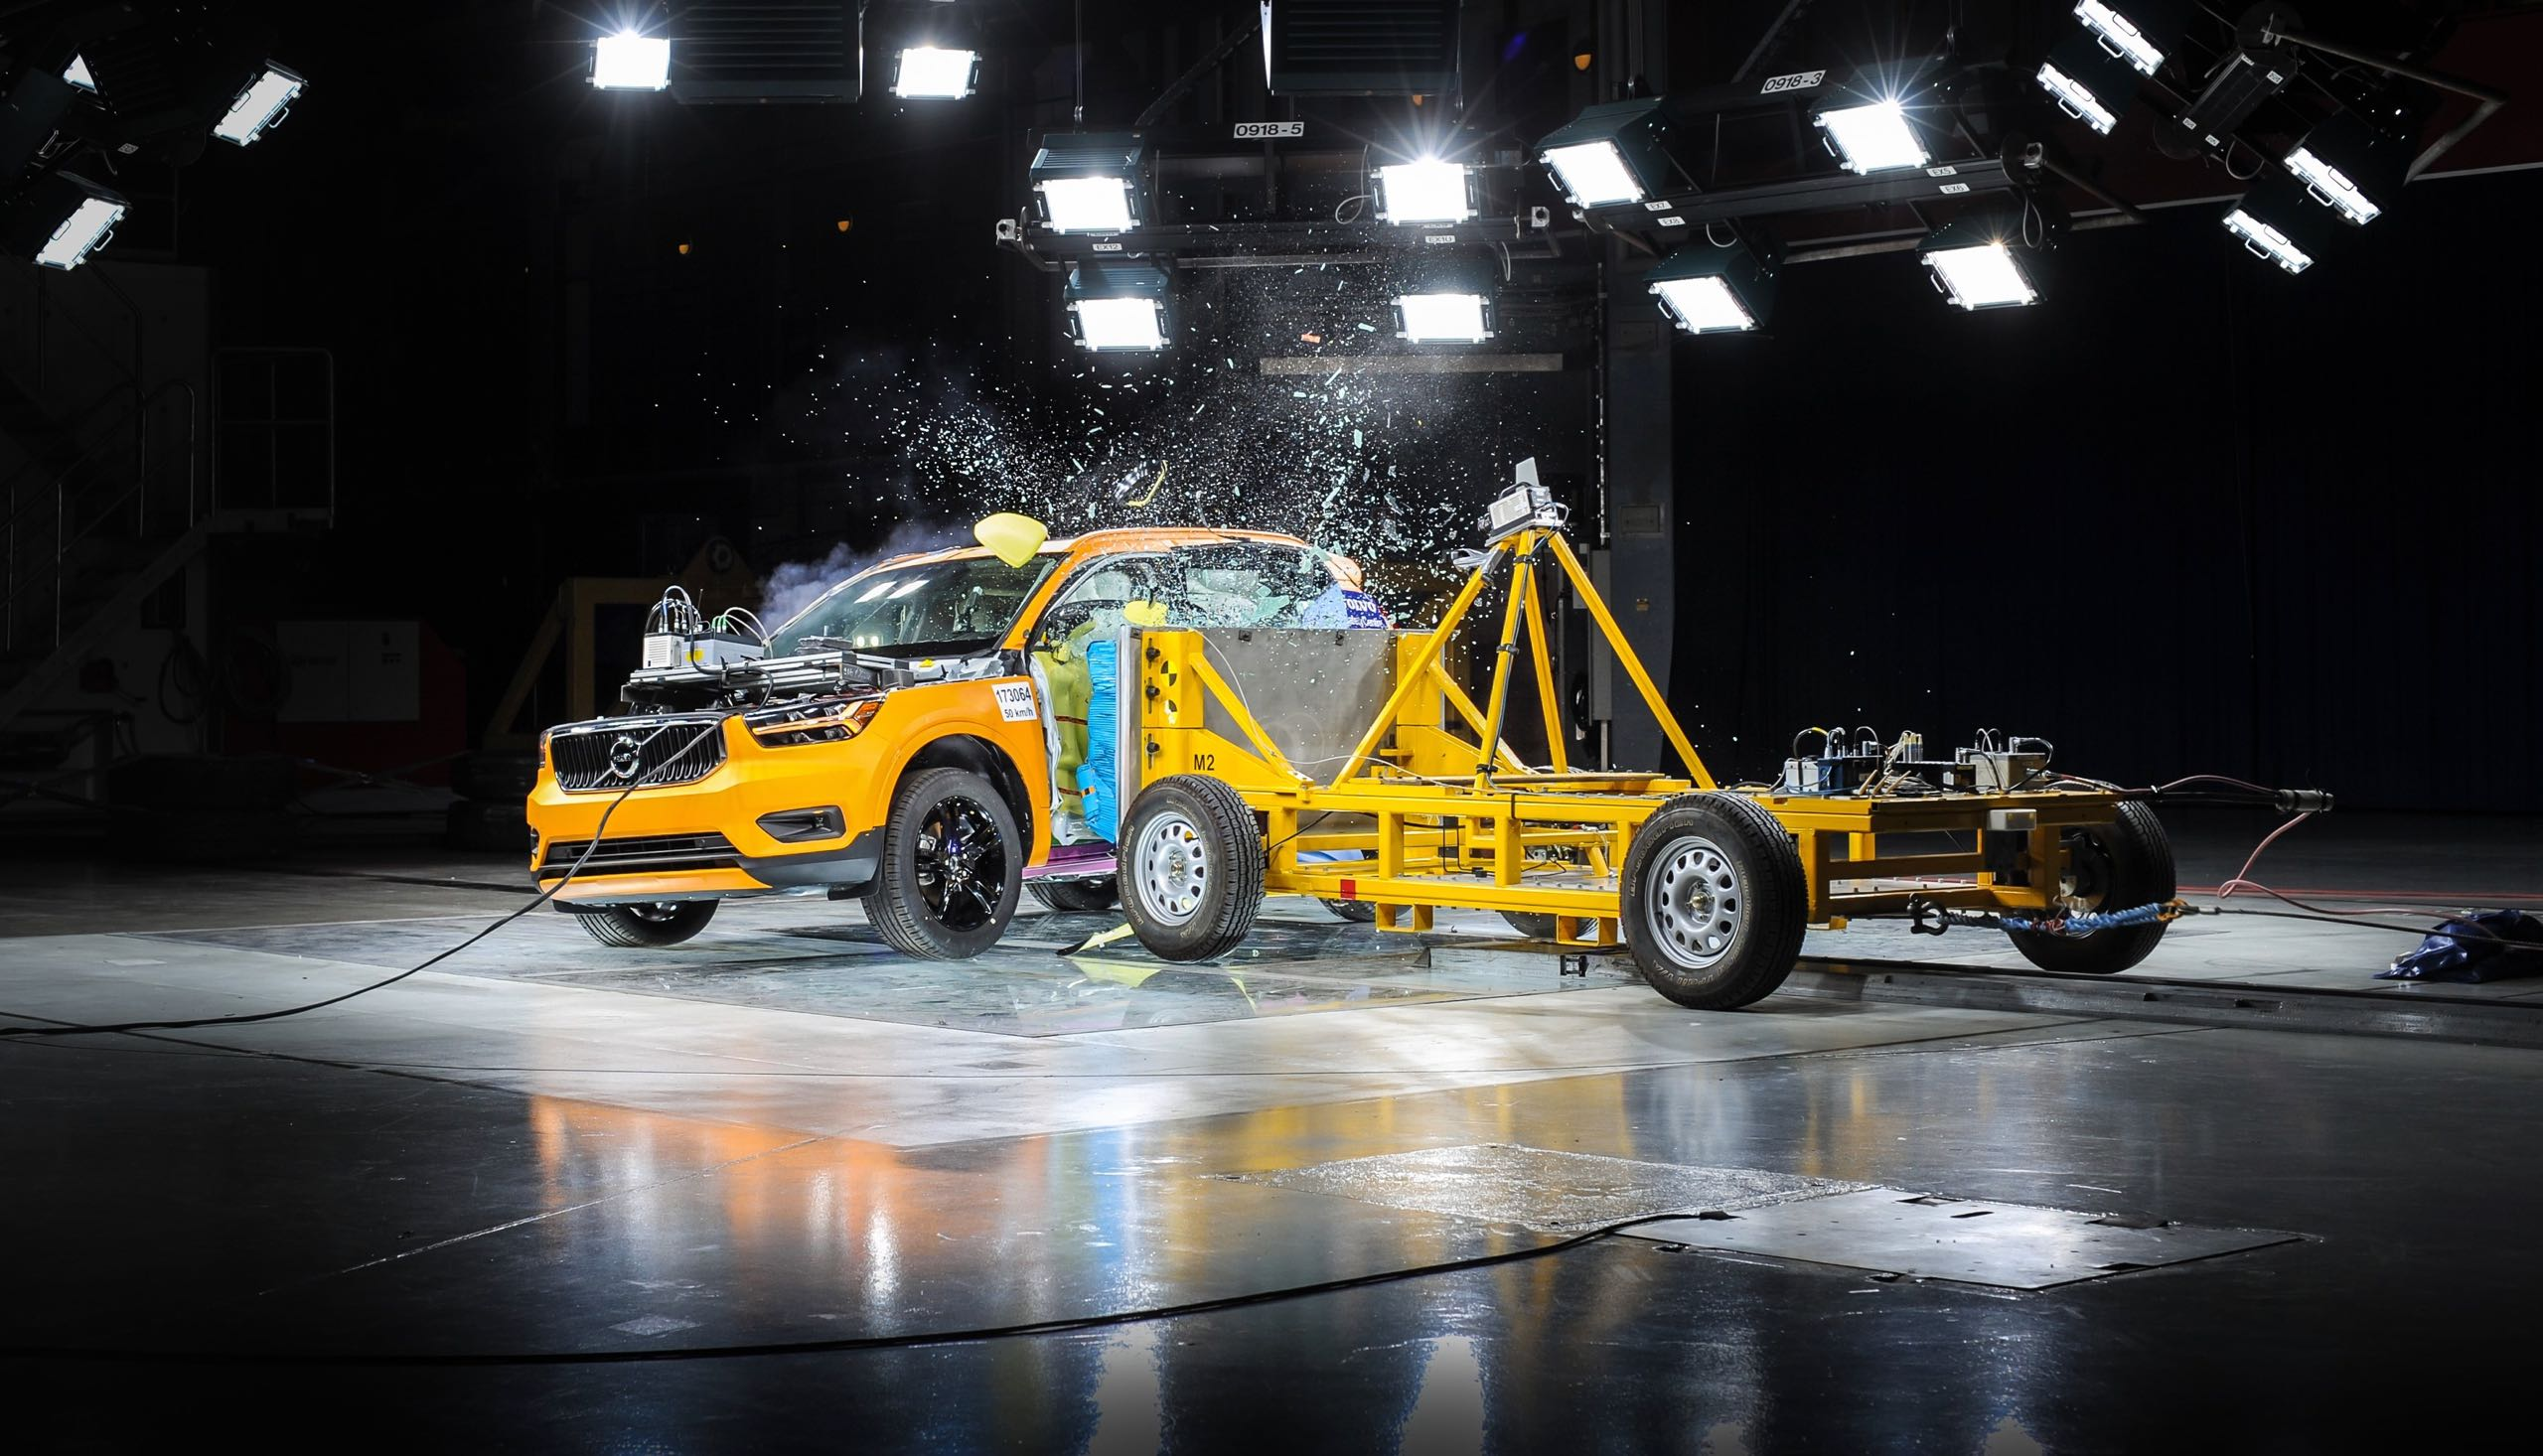 New Volvo XC40 Crash Test -  2017, 2018, 2018 New XC40, Exterior, Images, New XC40, Quality, Safety